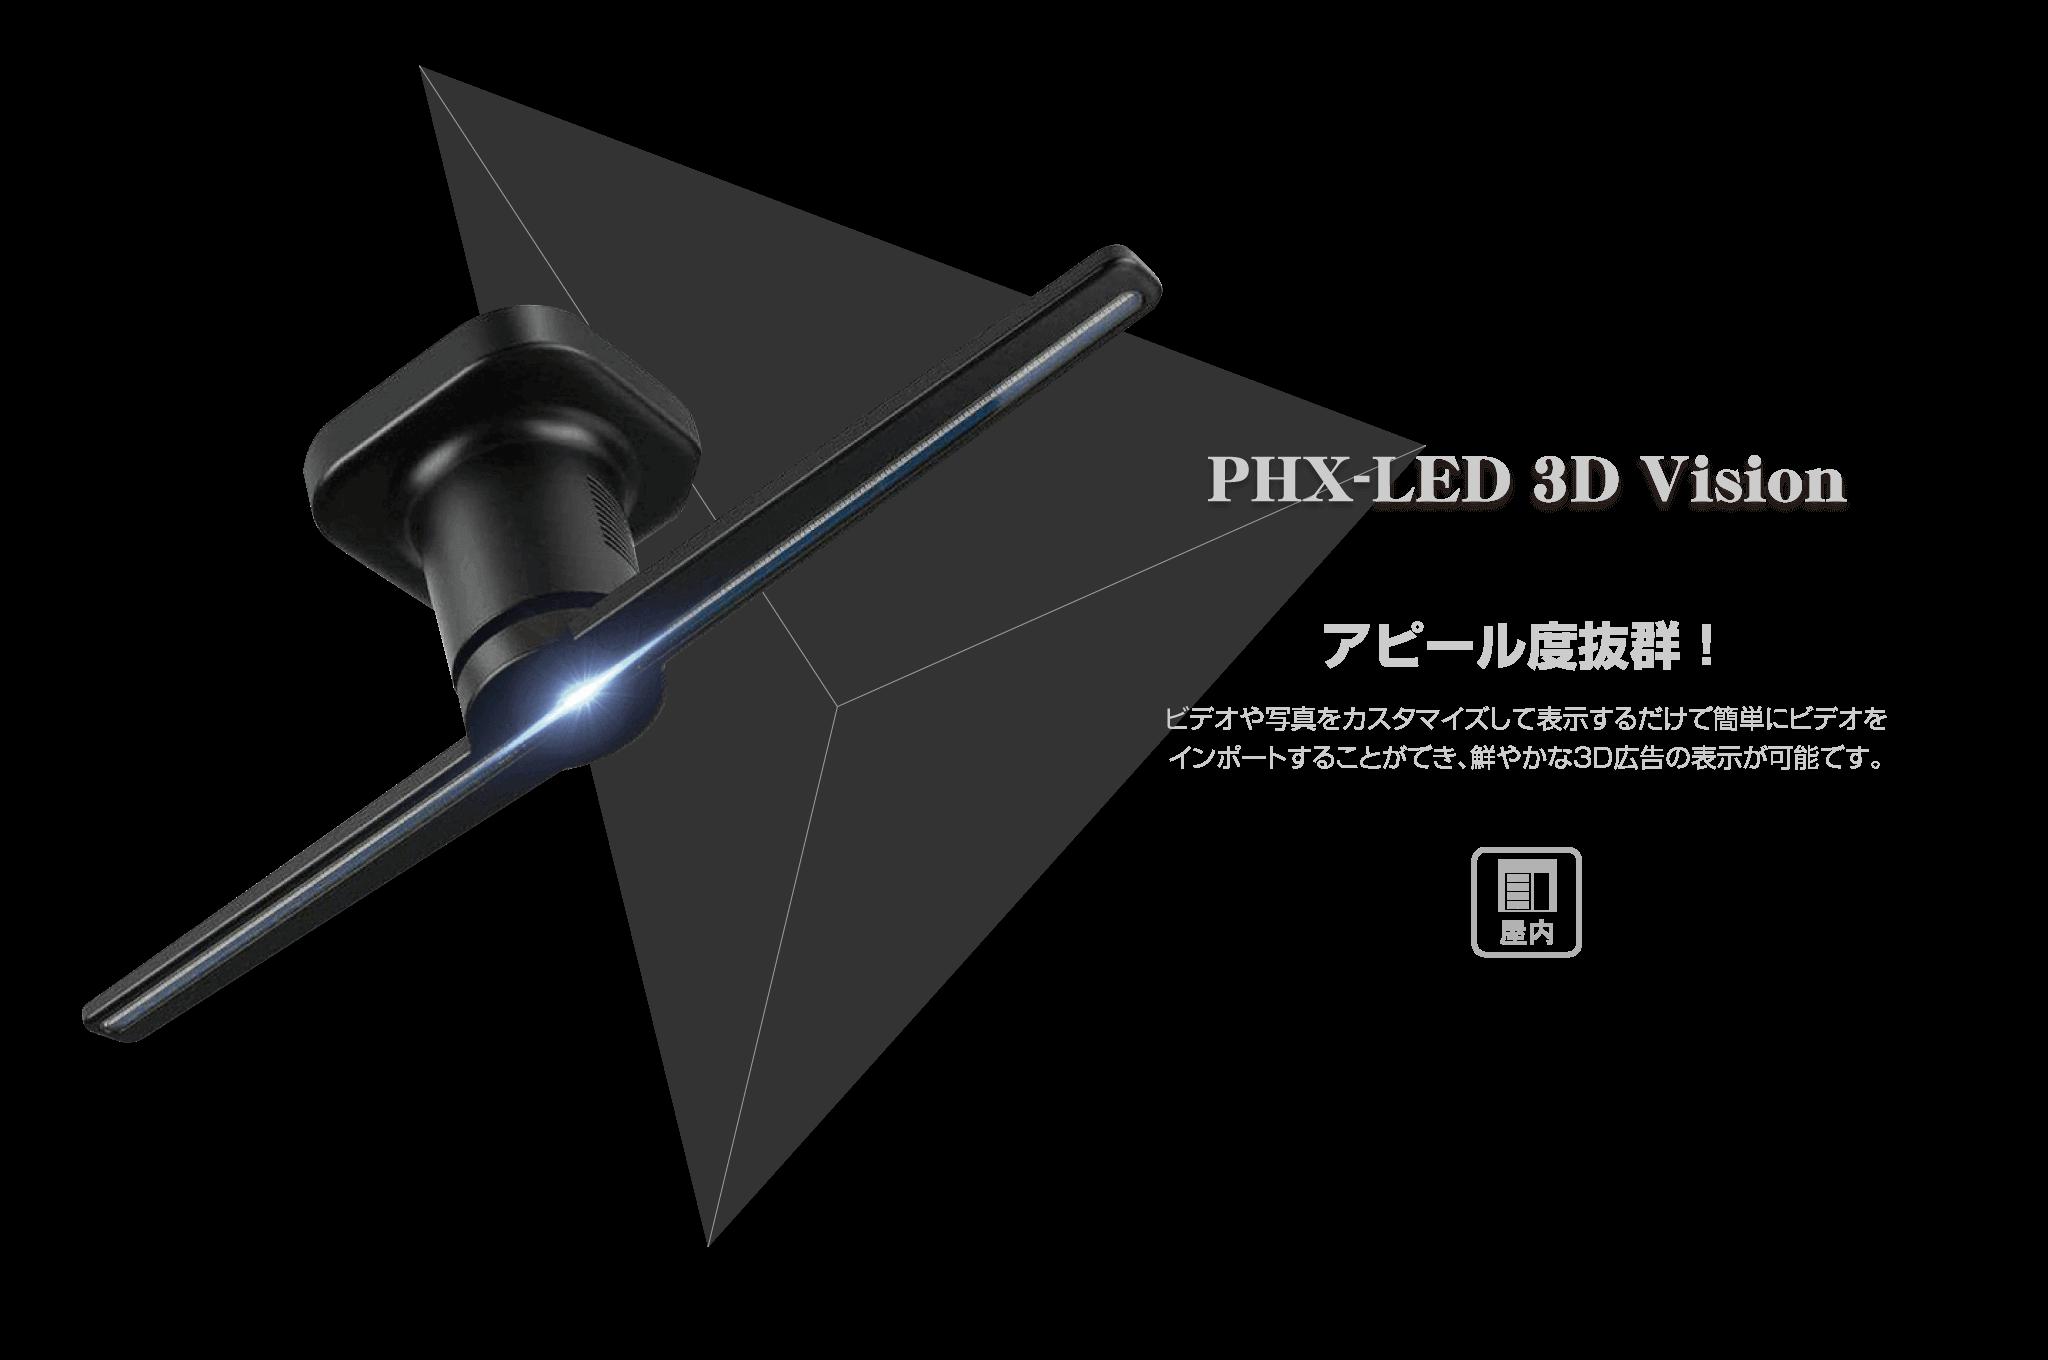 3Dビジョン